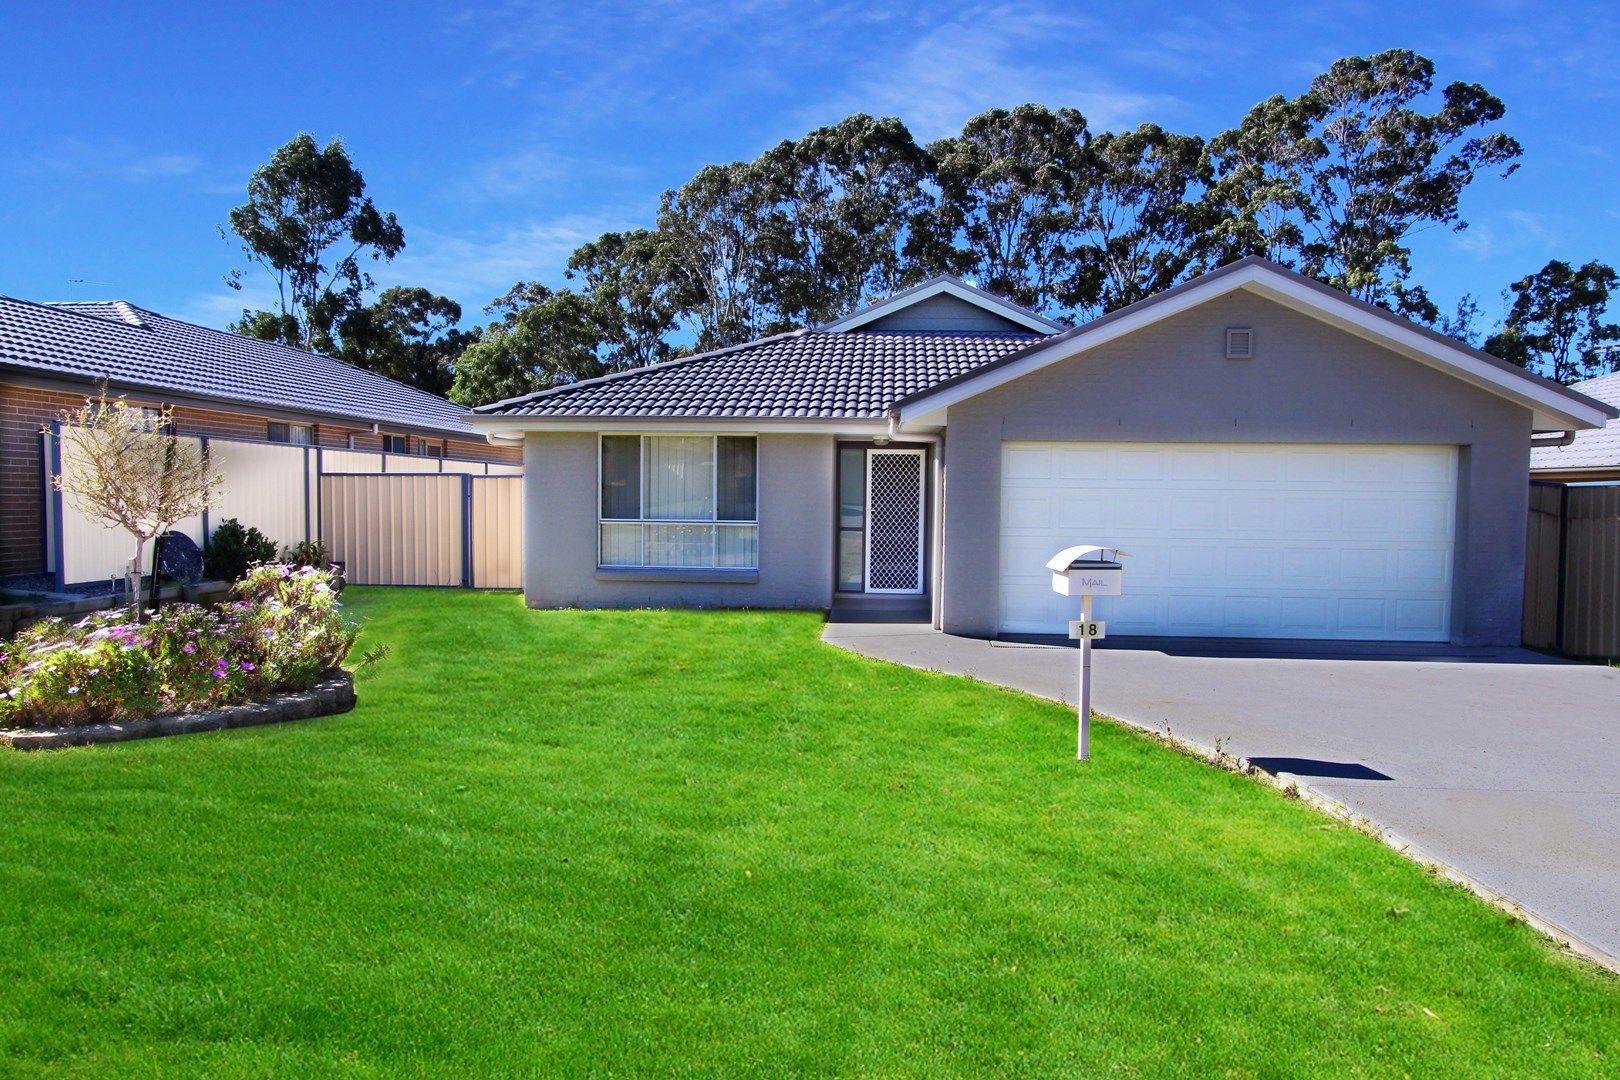 18 Marsanne Close, Cessnock NSW 2325, Image 0